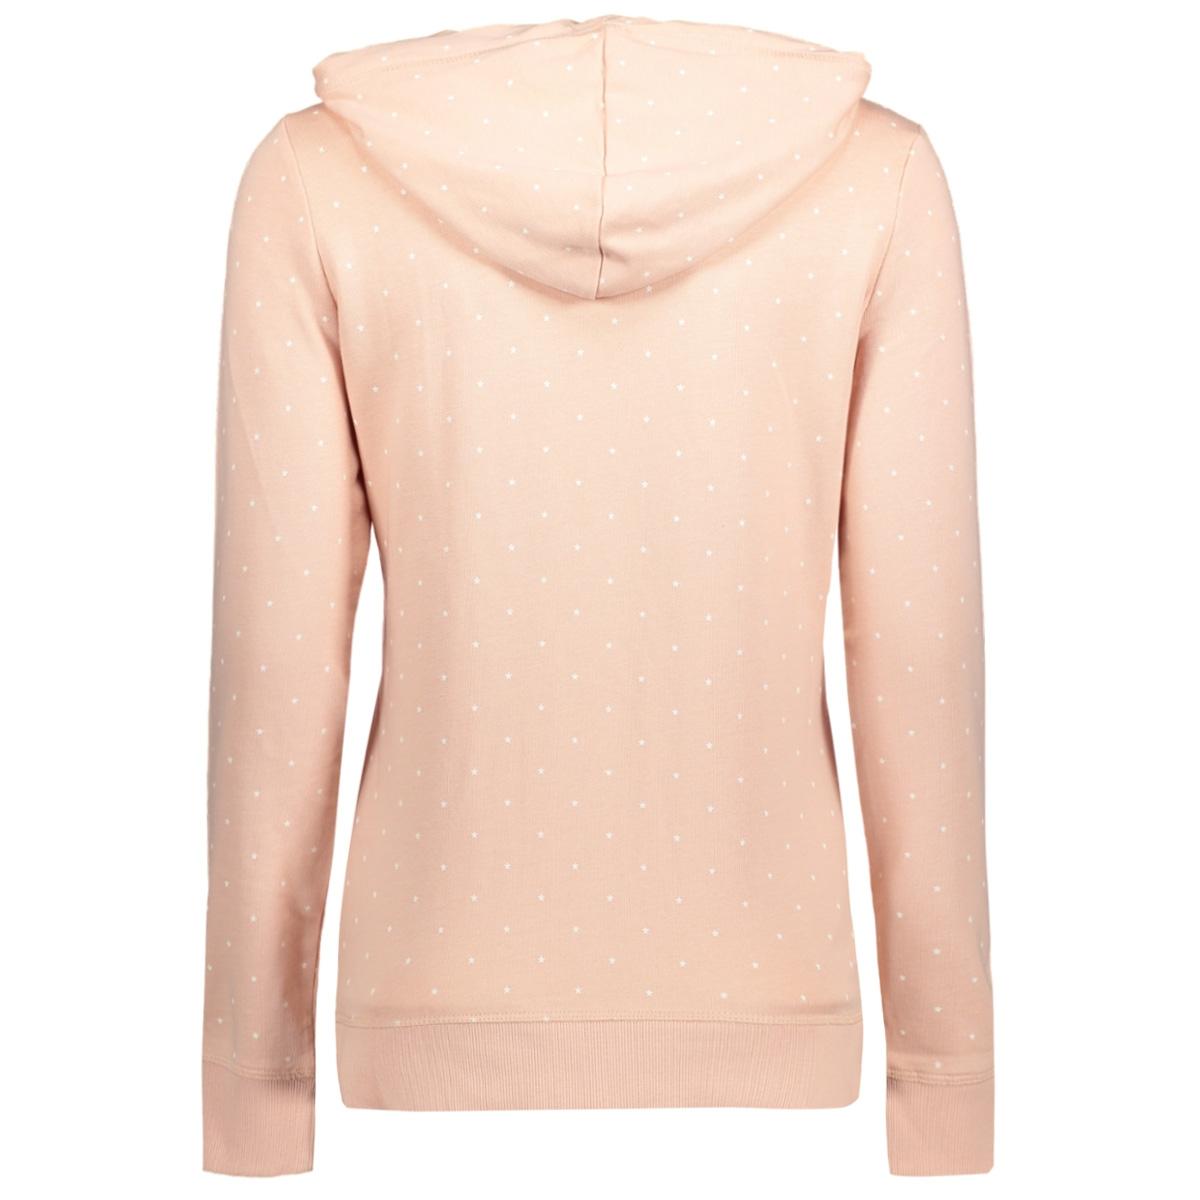 2531354.09.71 tom tailor sweater 4676